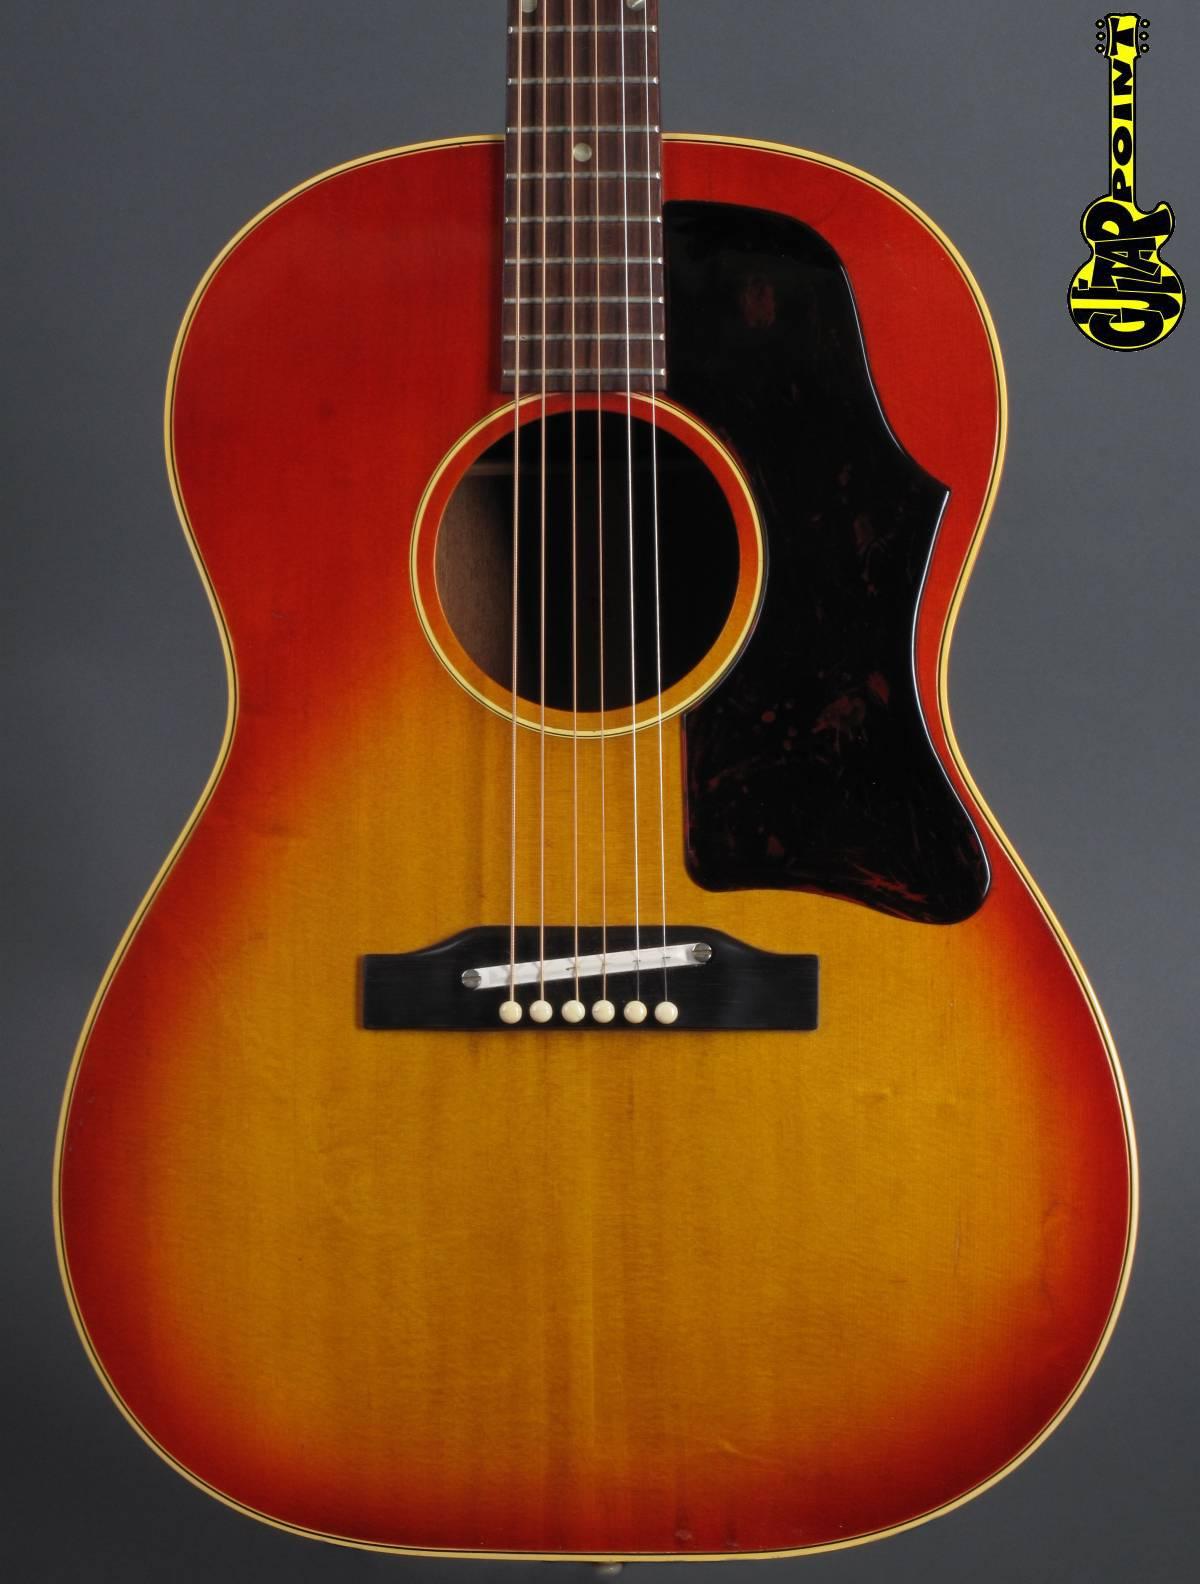 1966 Gibson B-25 - Cherry Sunburst